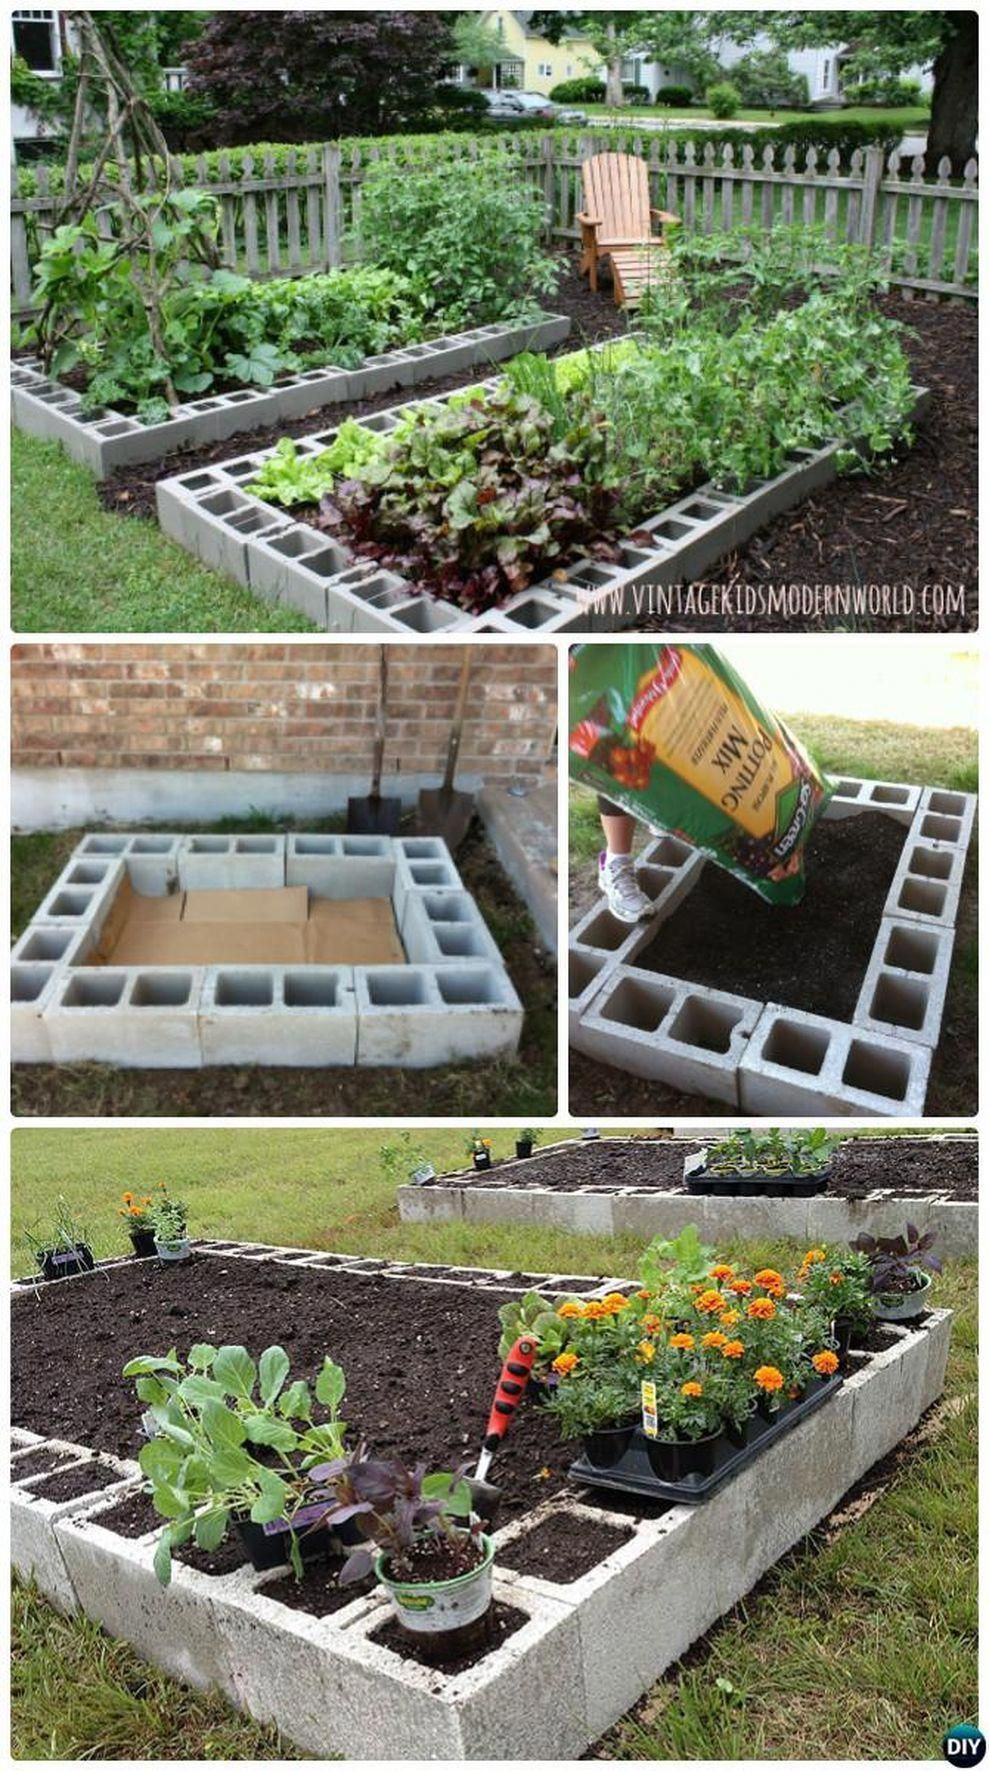 Modern Landscape Design For Small Spaces In 2020 Backyard Vegetable Gardens Vegetable Garden Raised Beds Diy Raised Garden Backyard raised garden design ideas